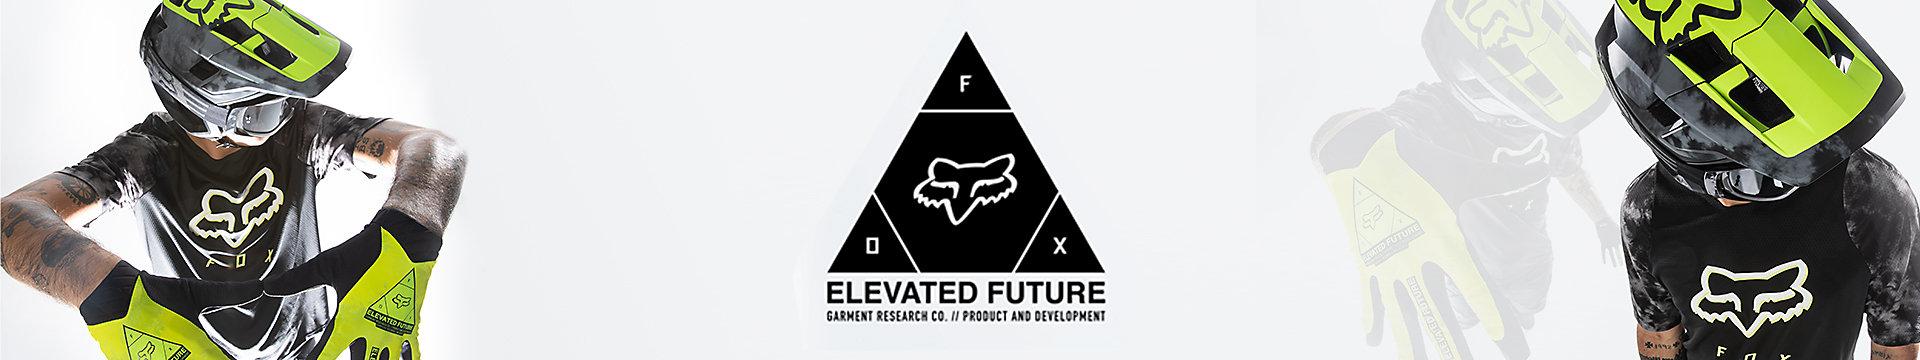 Elevated Future